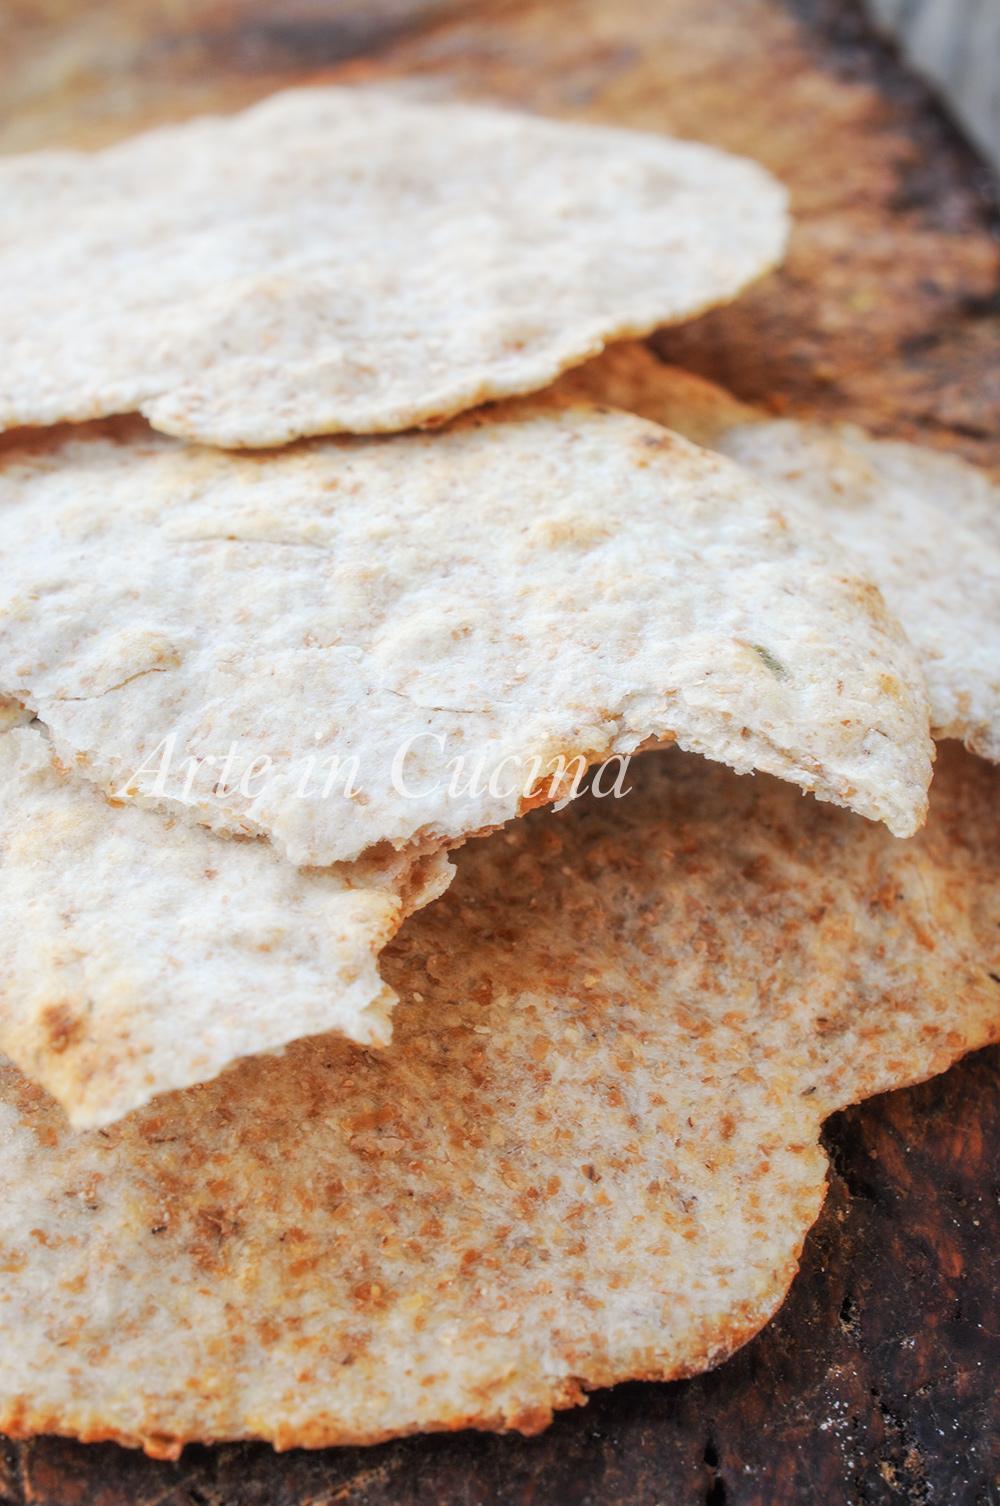 Chapati pane indiano ricetta originale veloce vickyart arte in cucina